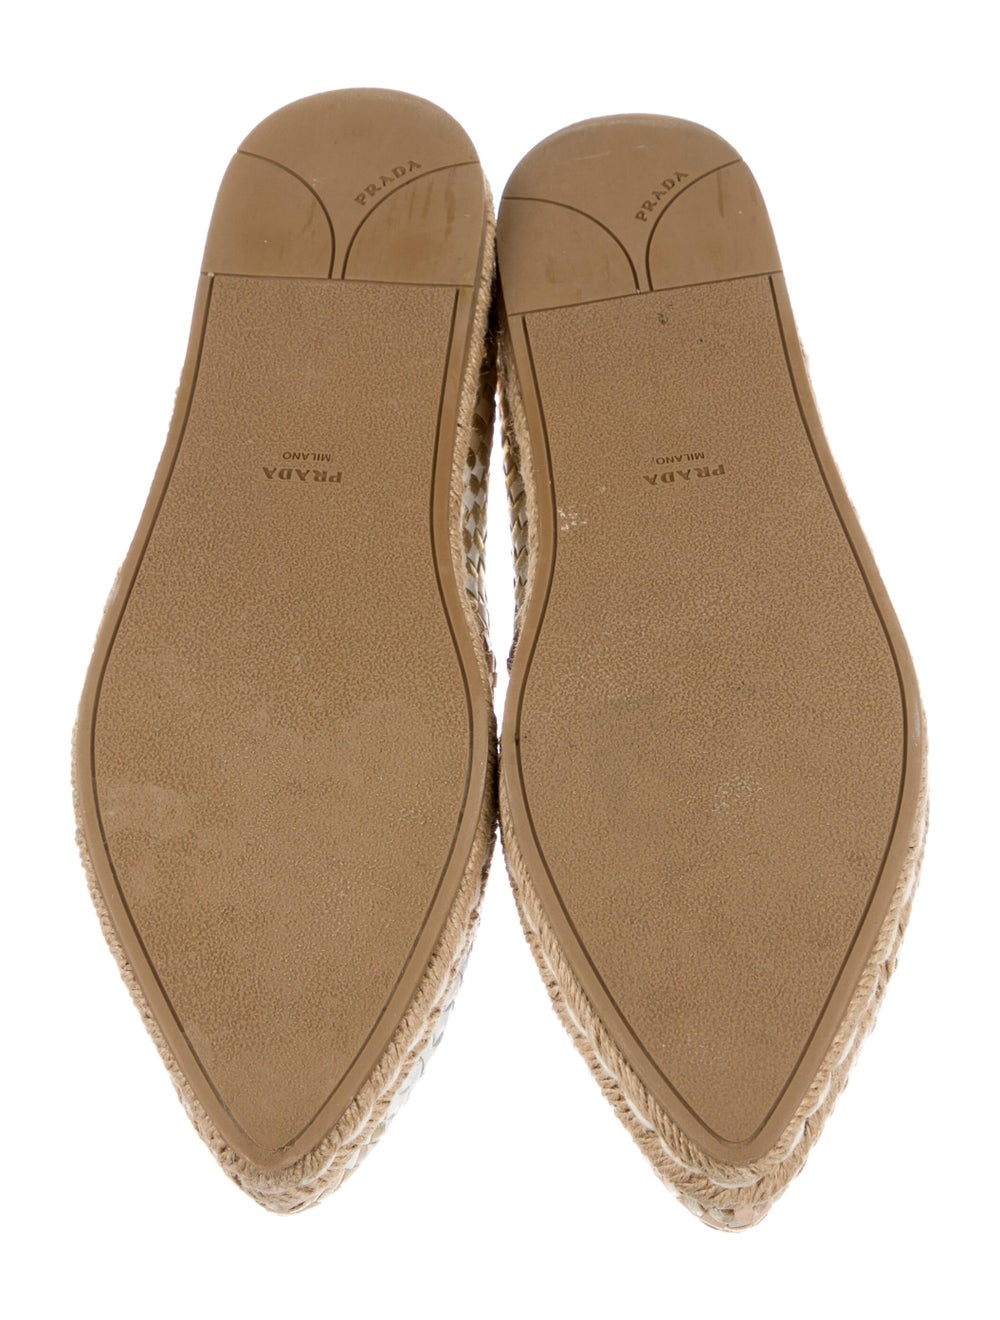 Prada Leather Patterned Espadrilles - image 5